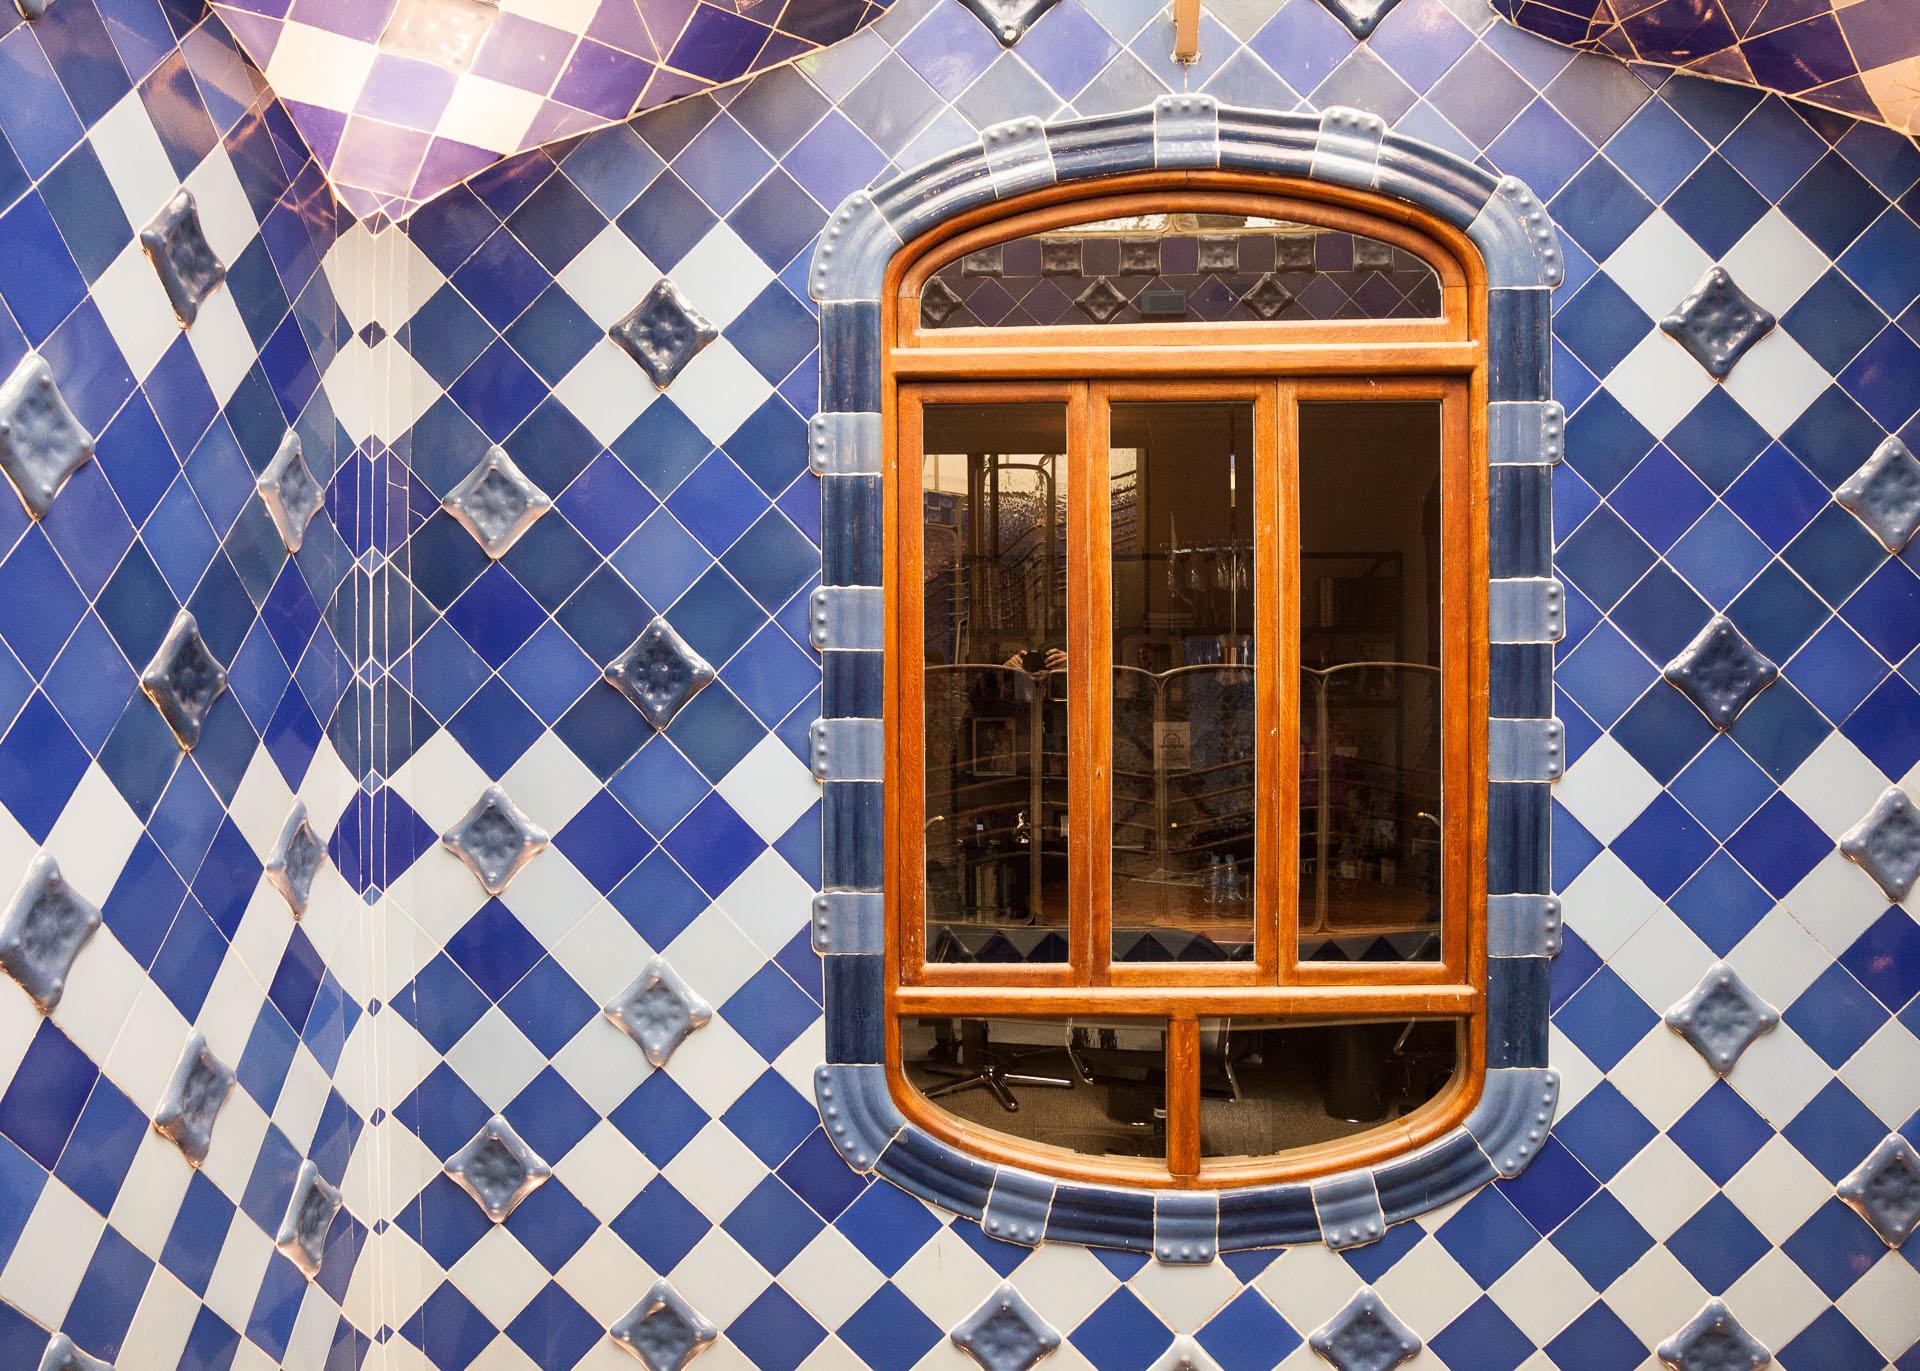 Casa Battló, Barcelona